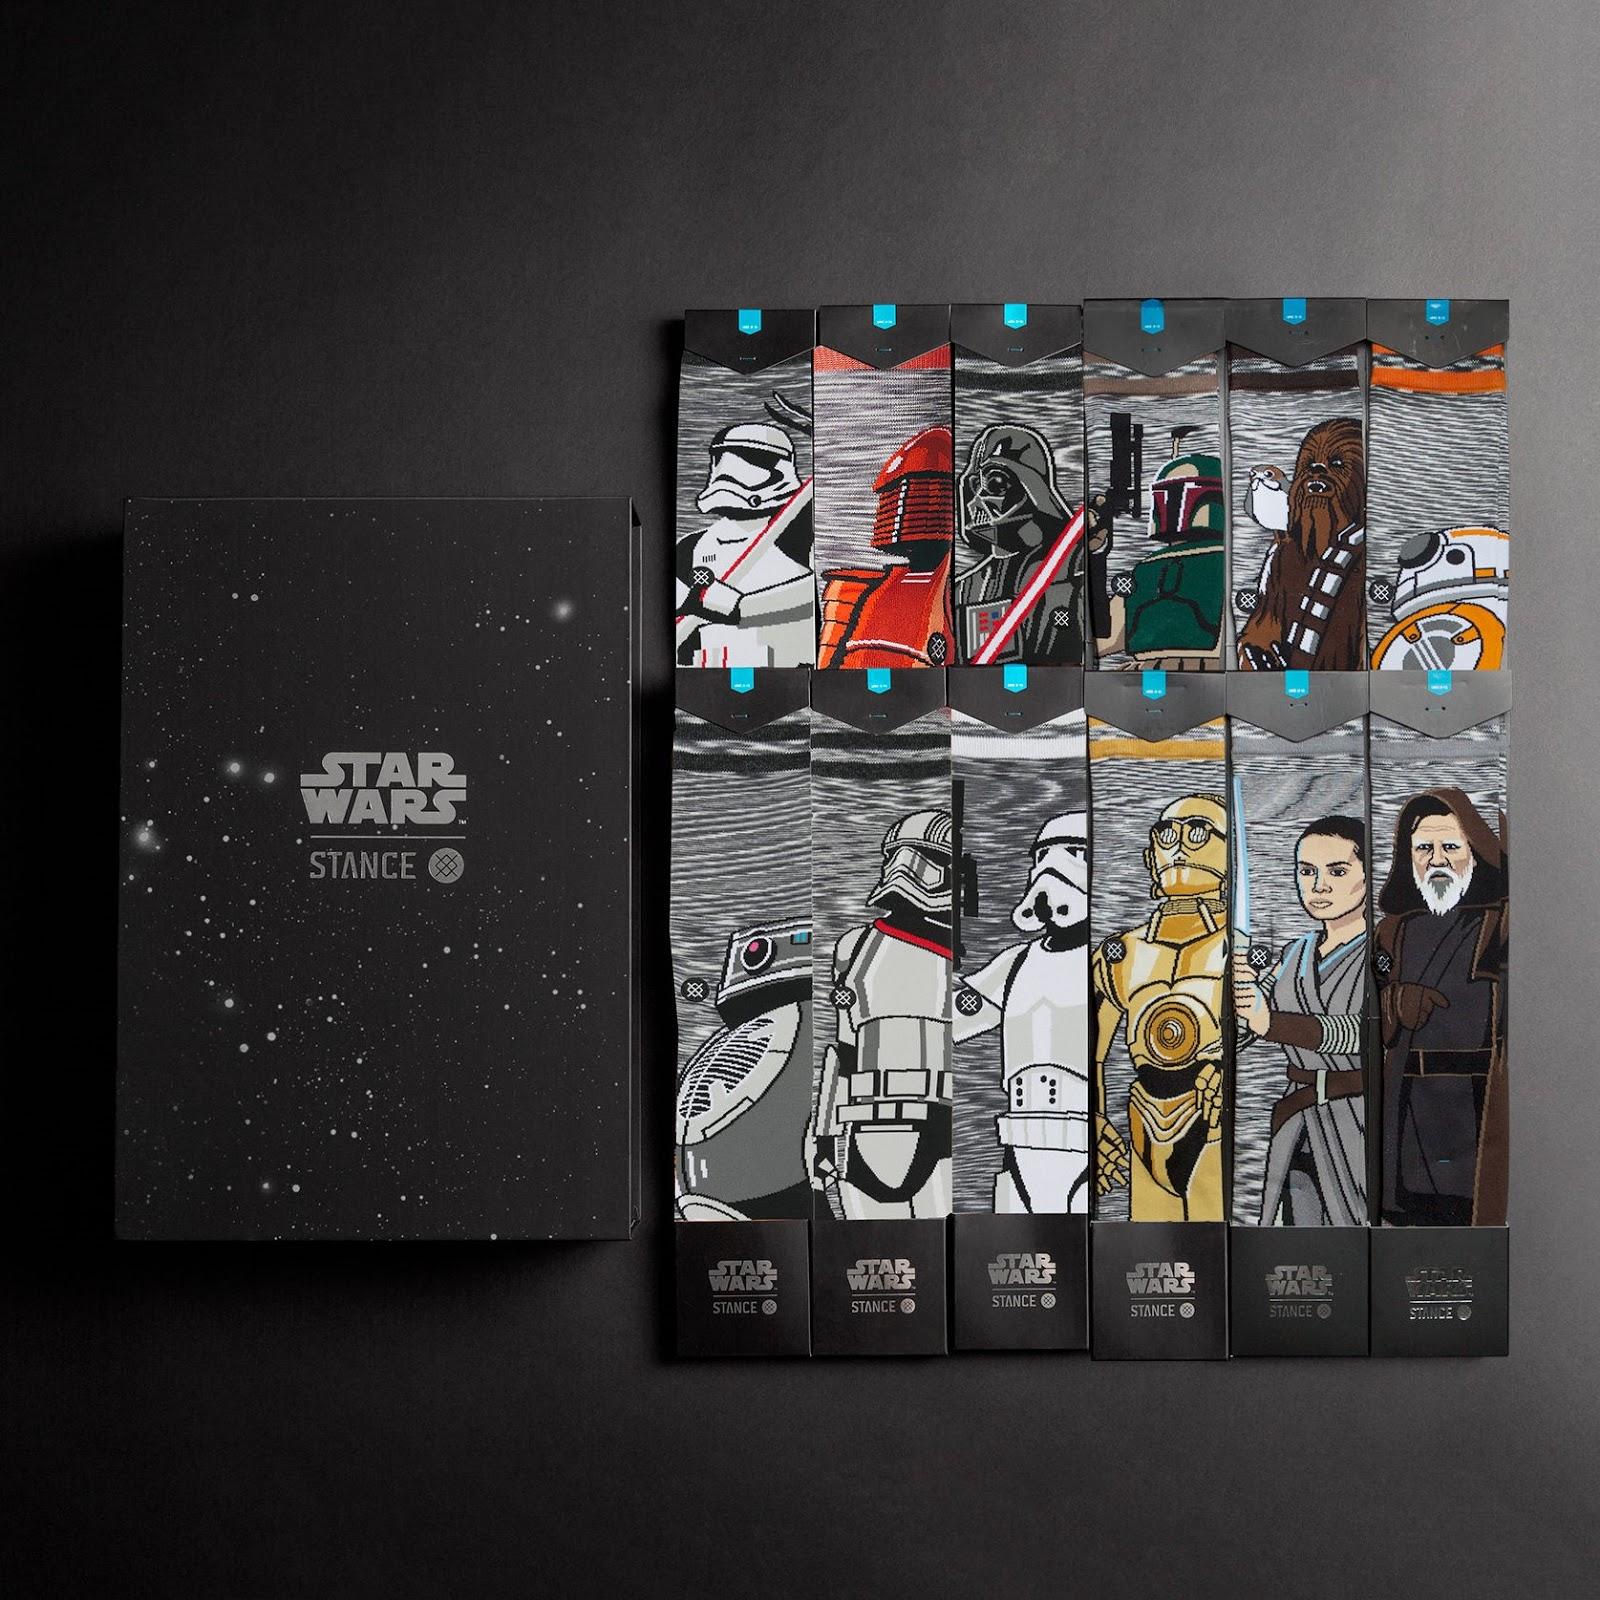 The Blot Says Star Wars The Last Jedi Designer Sock